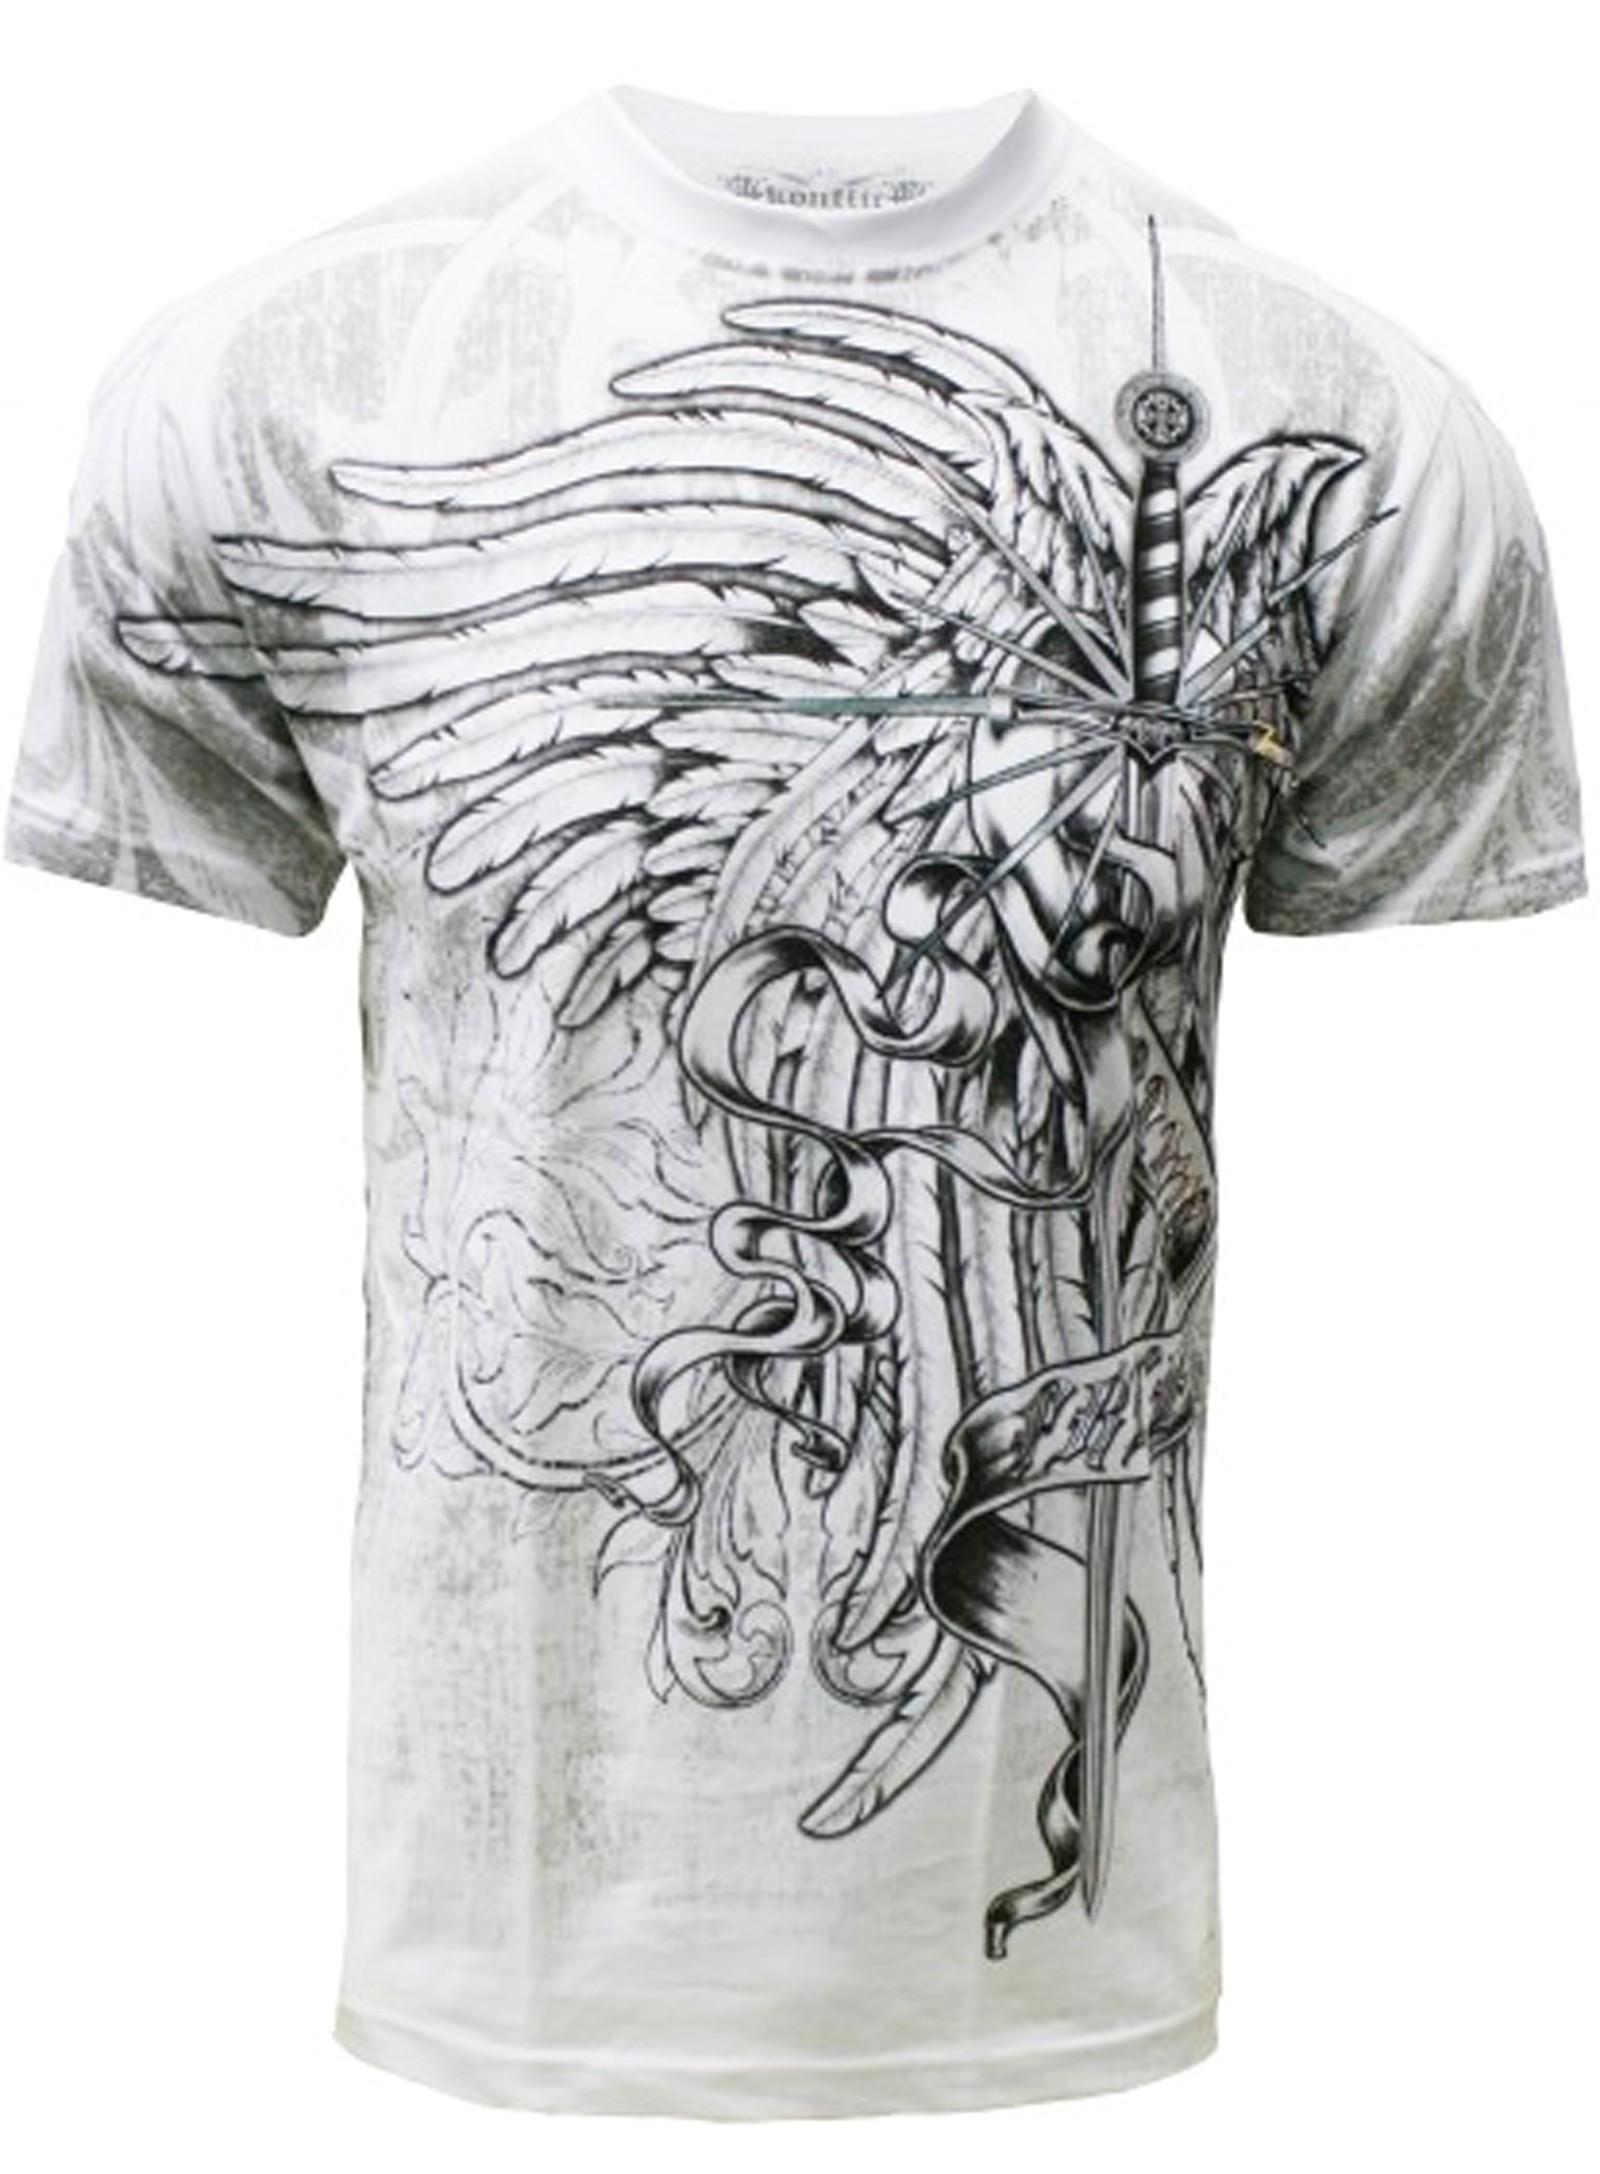 Konflic Clothing - Be My Shield T-Shirt